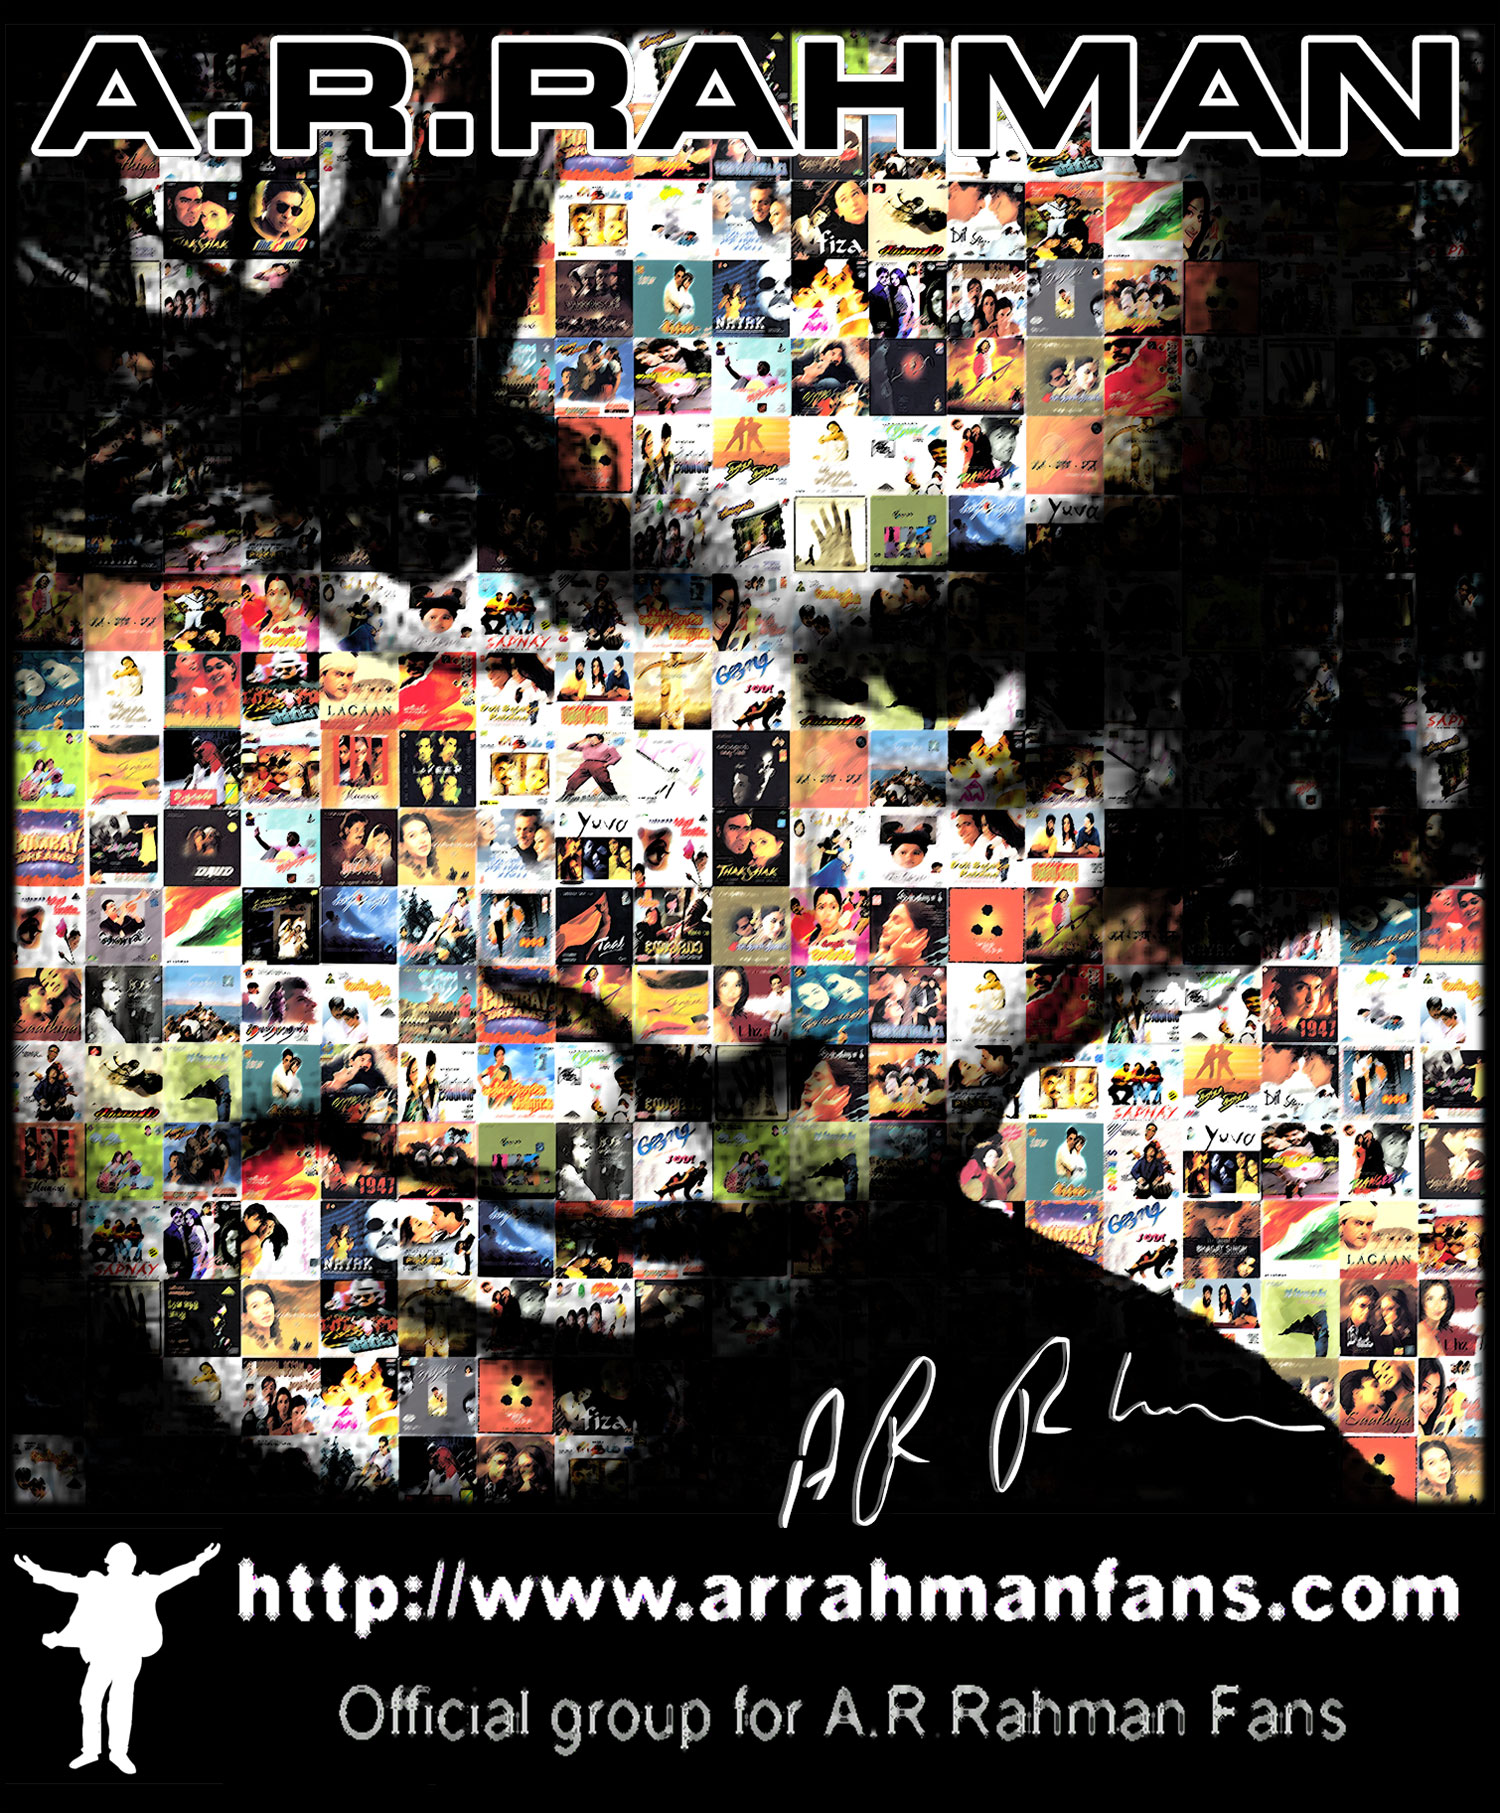 The A.R.Rahman Fans T Shirt by amithchandhran